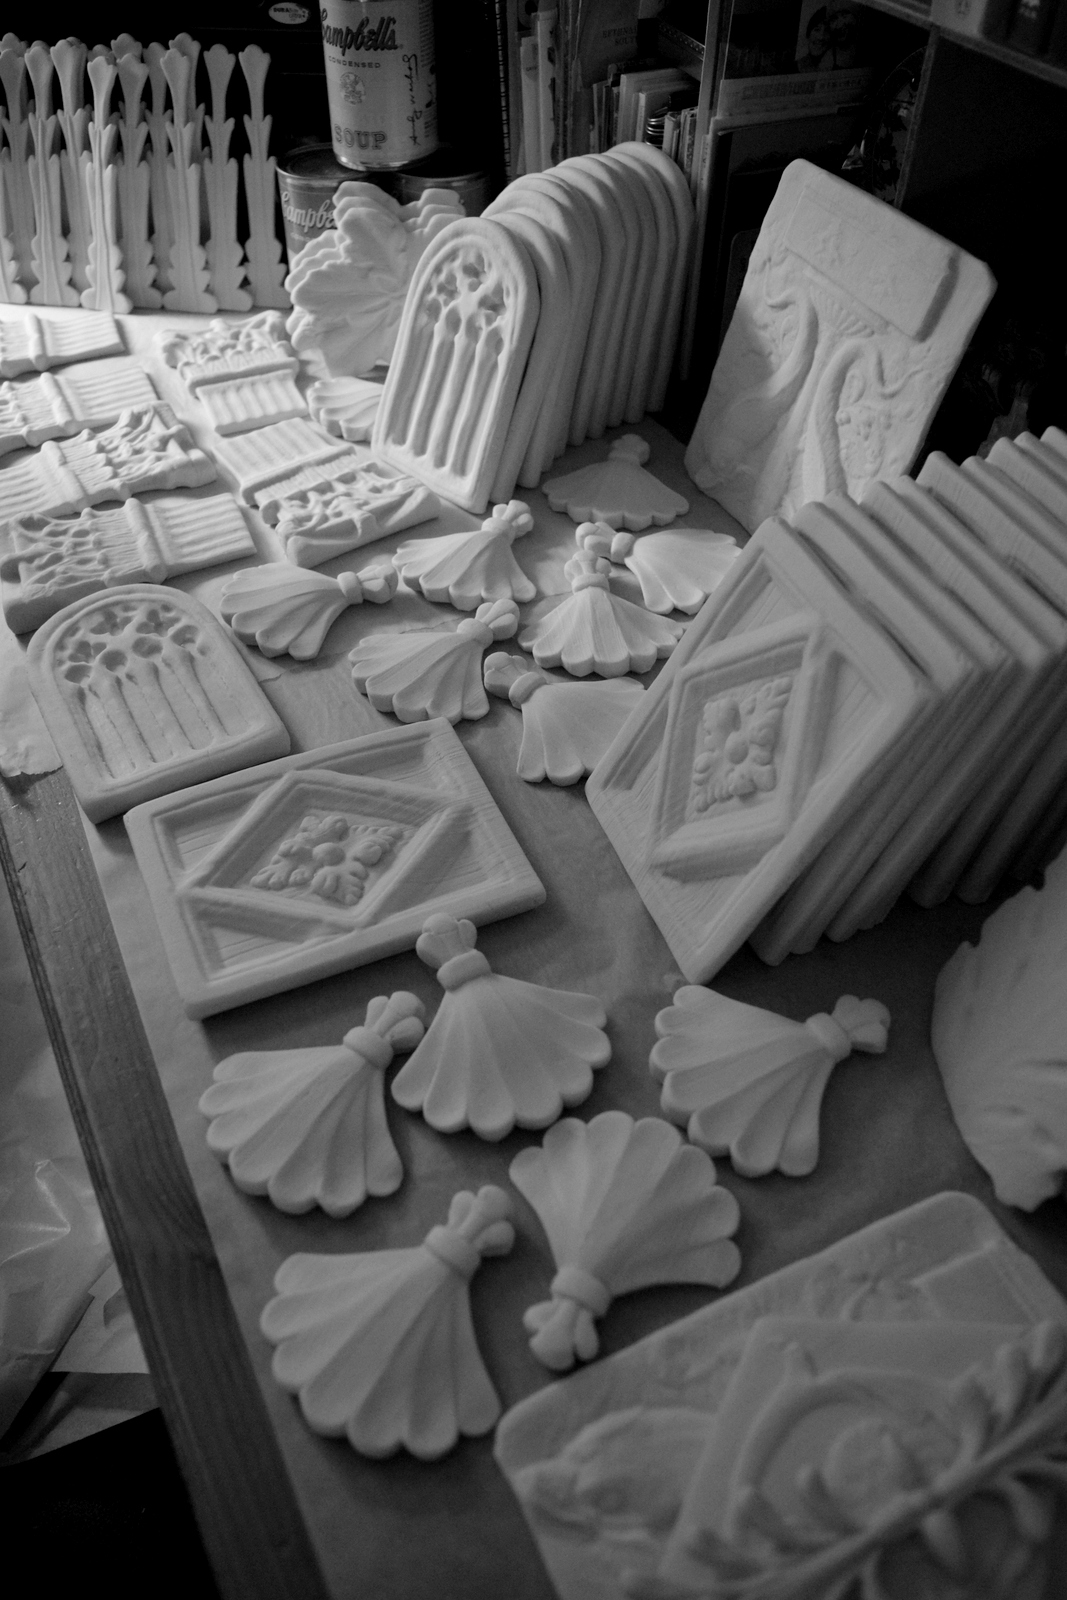 Alabaster Ruins (making of) Photo - Tasha Marks (27) lo-res.JPG